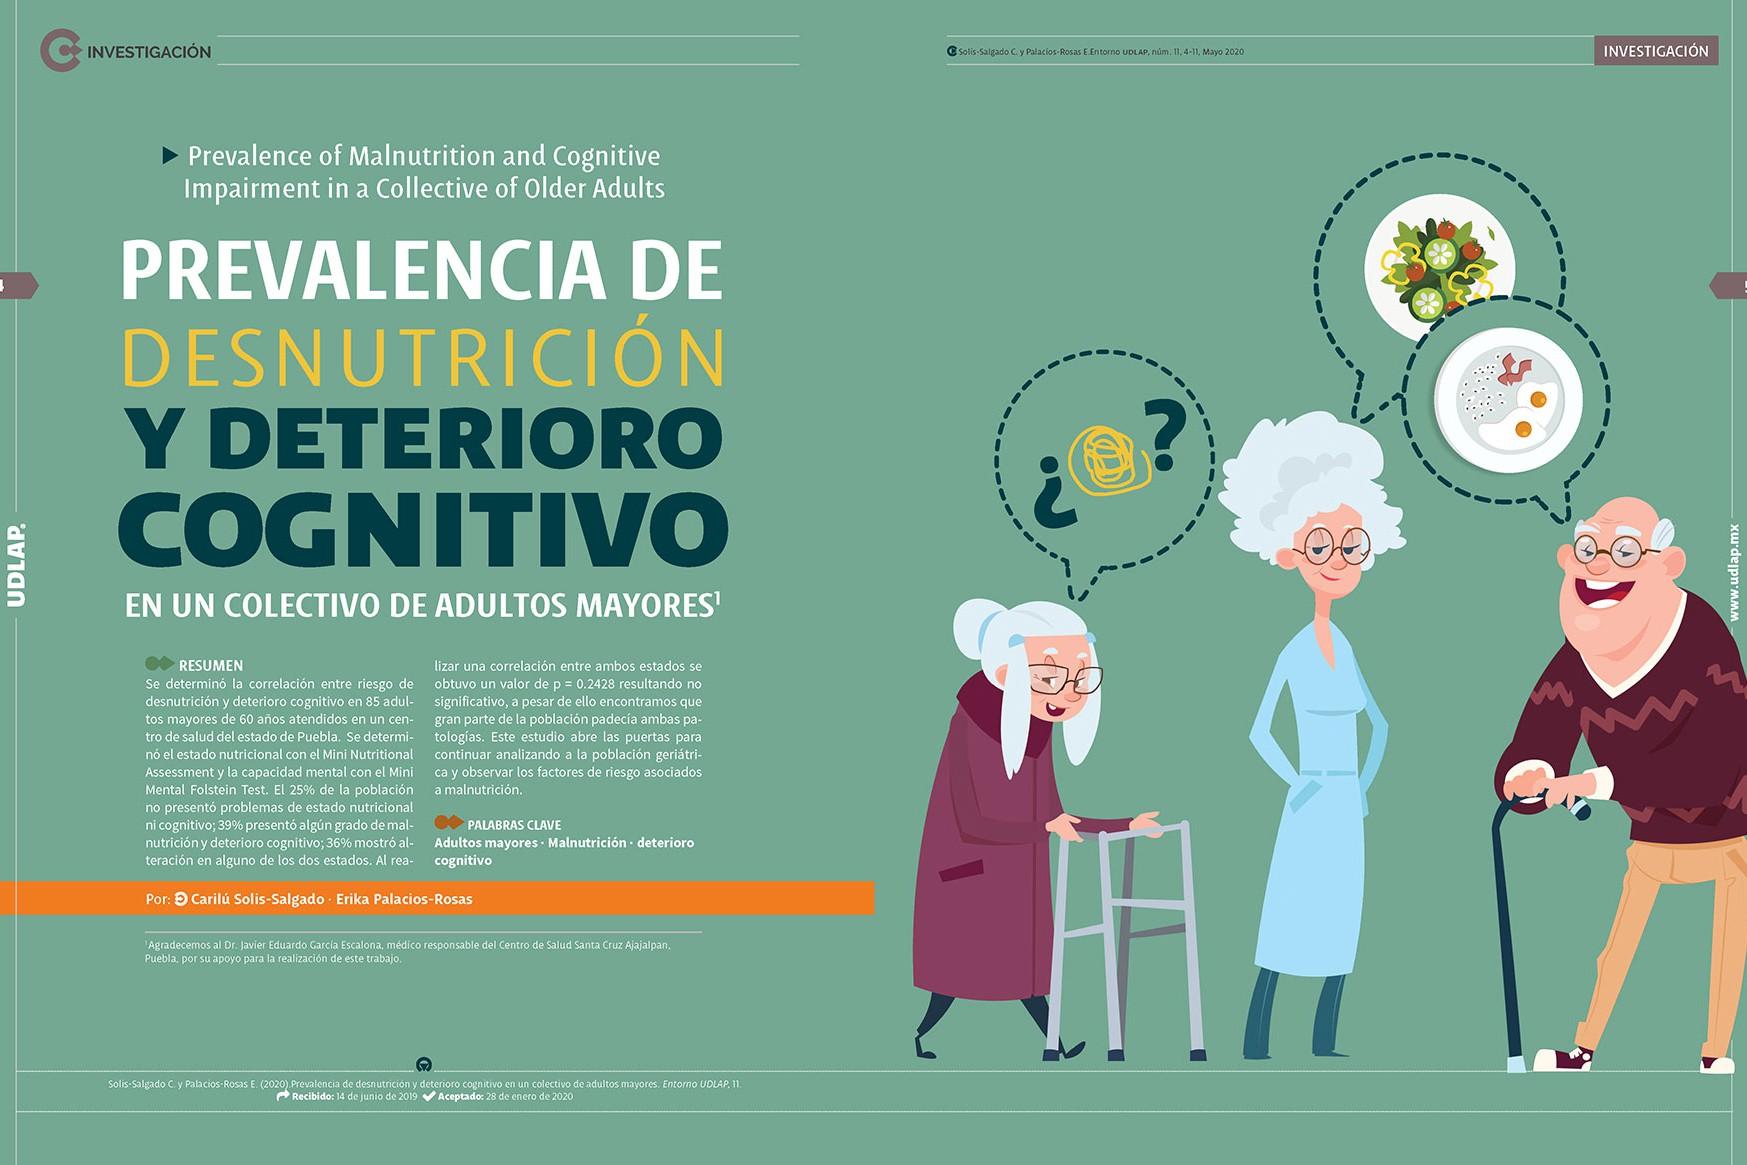 desnutricion-adultos-mayores-UDLAP